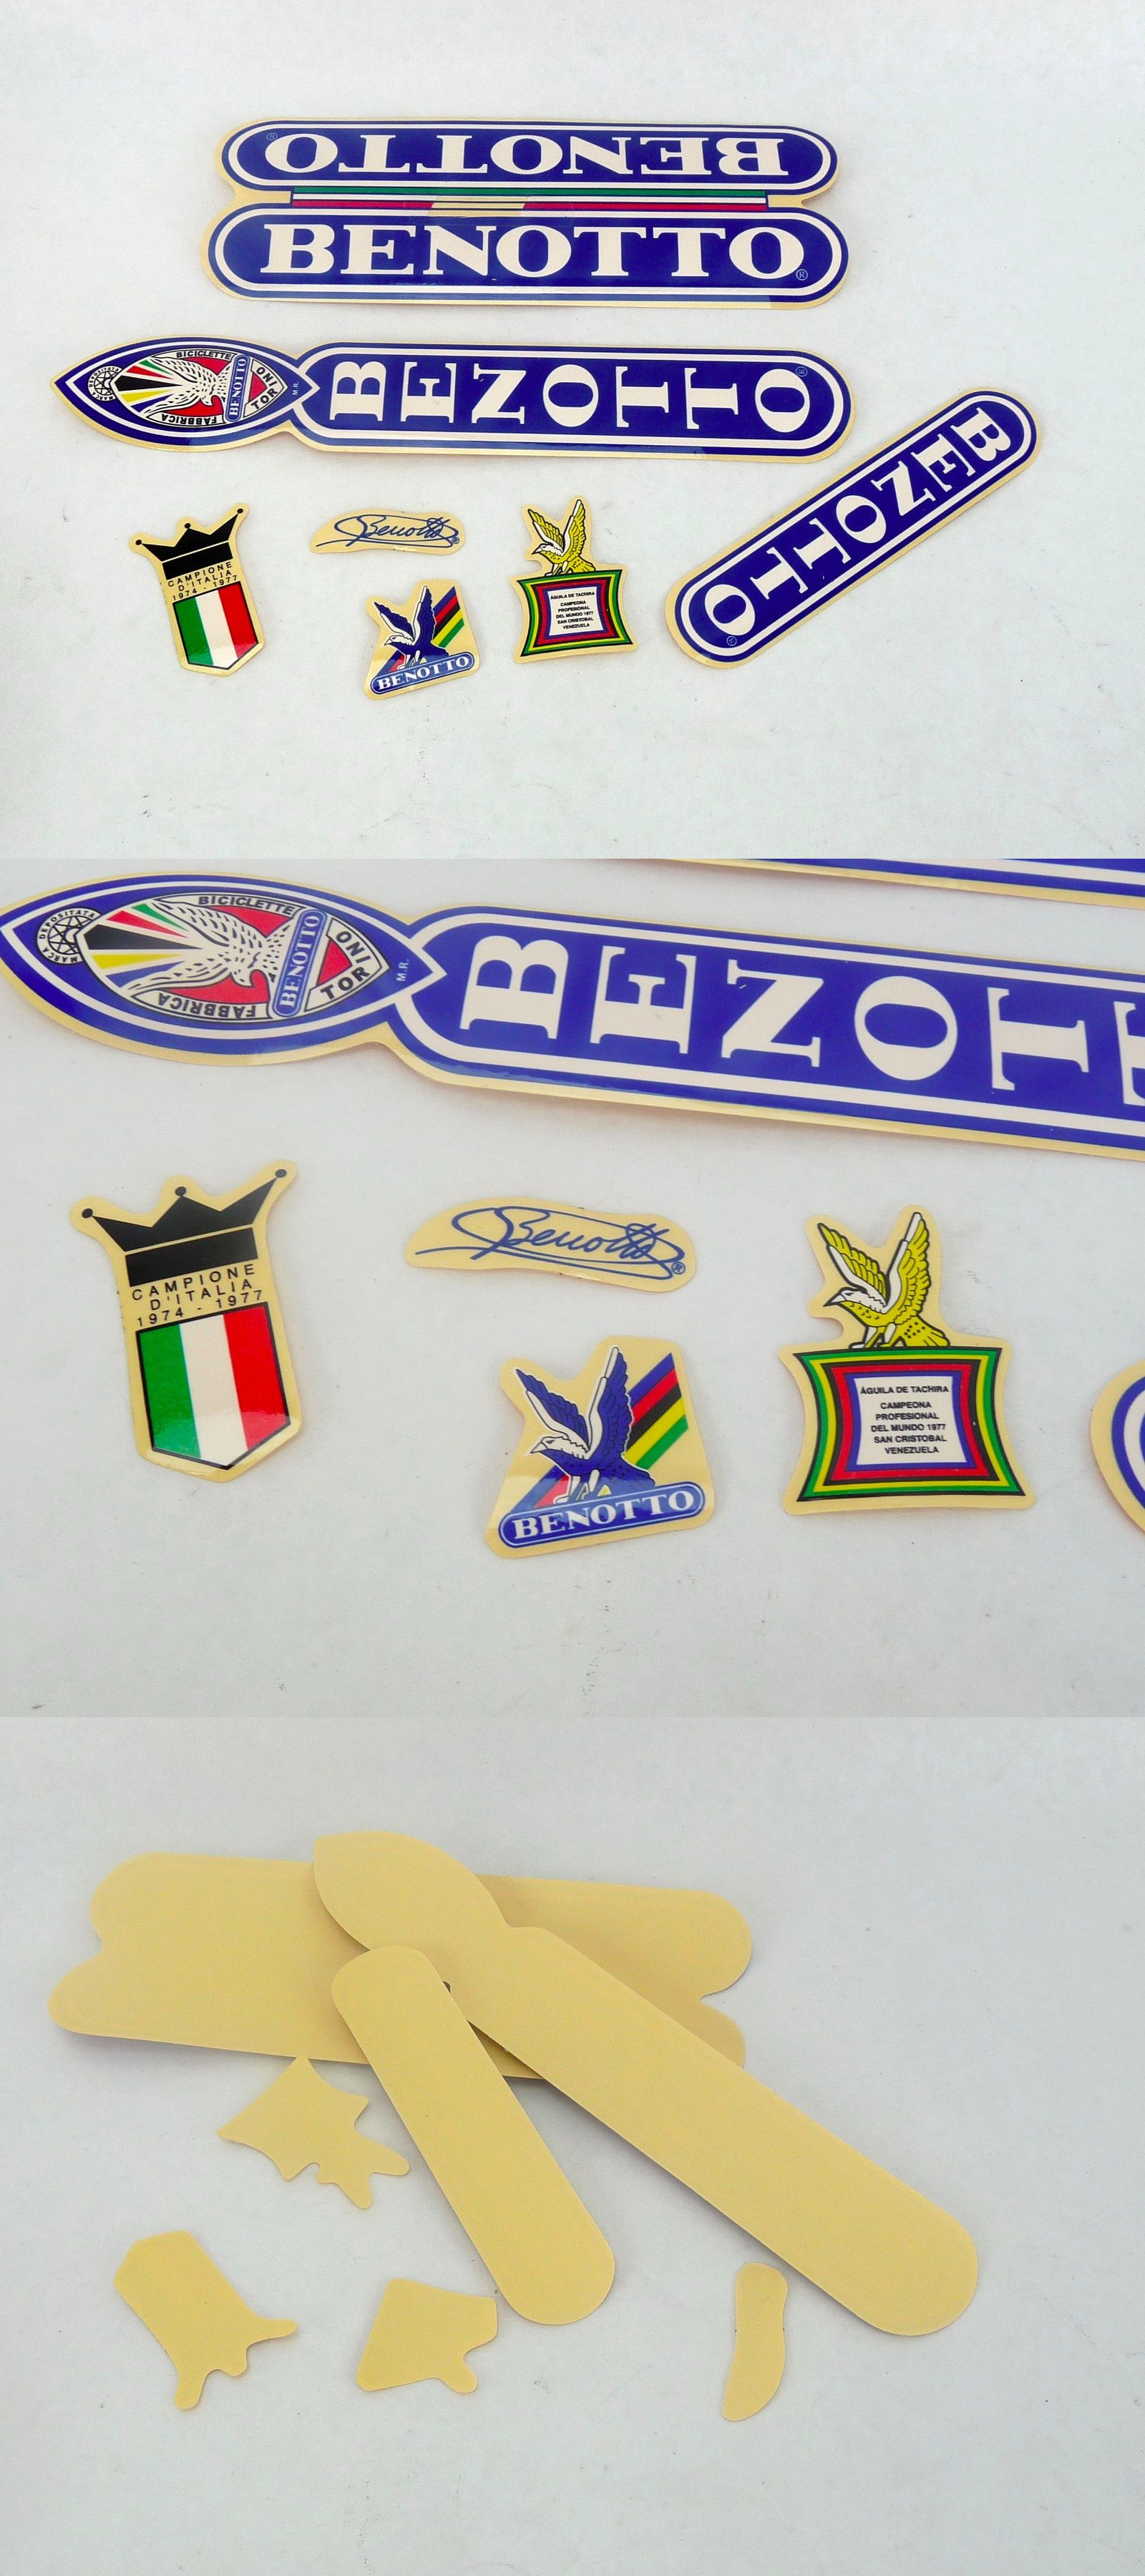 Decals Stickers 106953  Benotto Decal Set Stickers Vintage